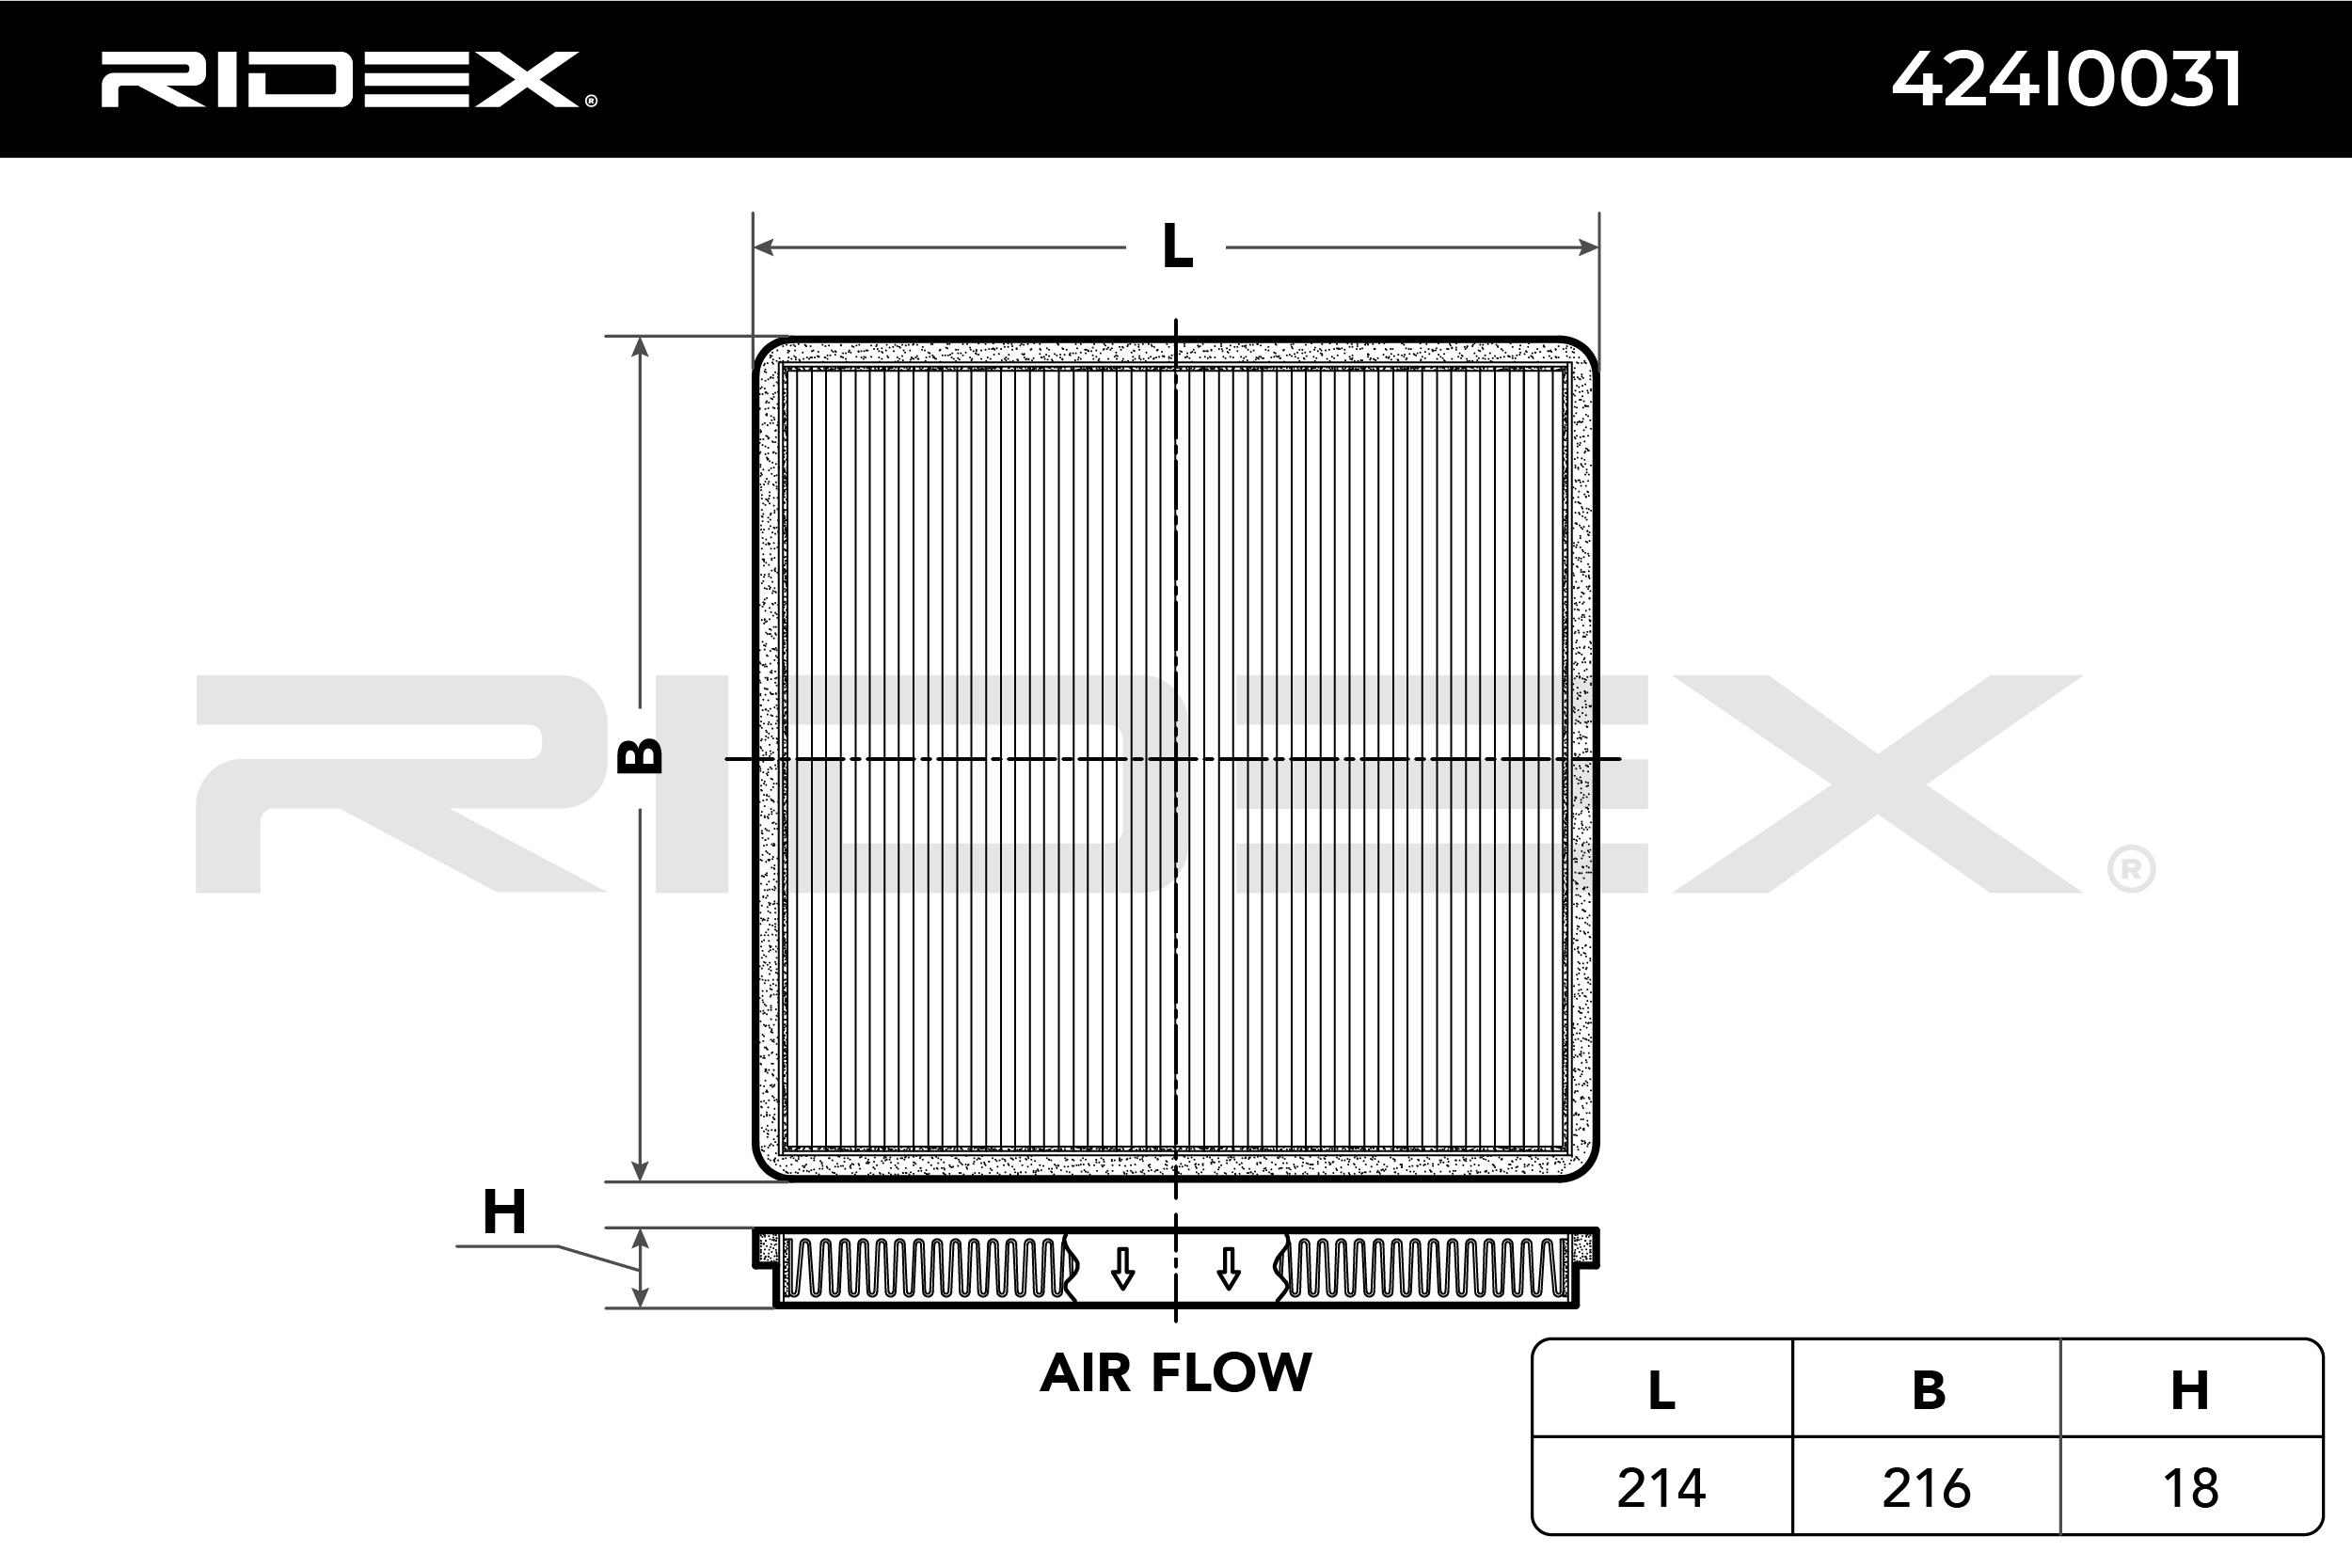 RIDEX: Original Filter Innenraumluft 424I0031 (Breite: 216,0mm, Höhe: 18,0mm)